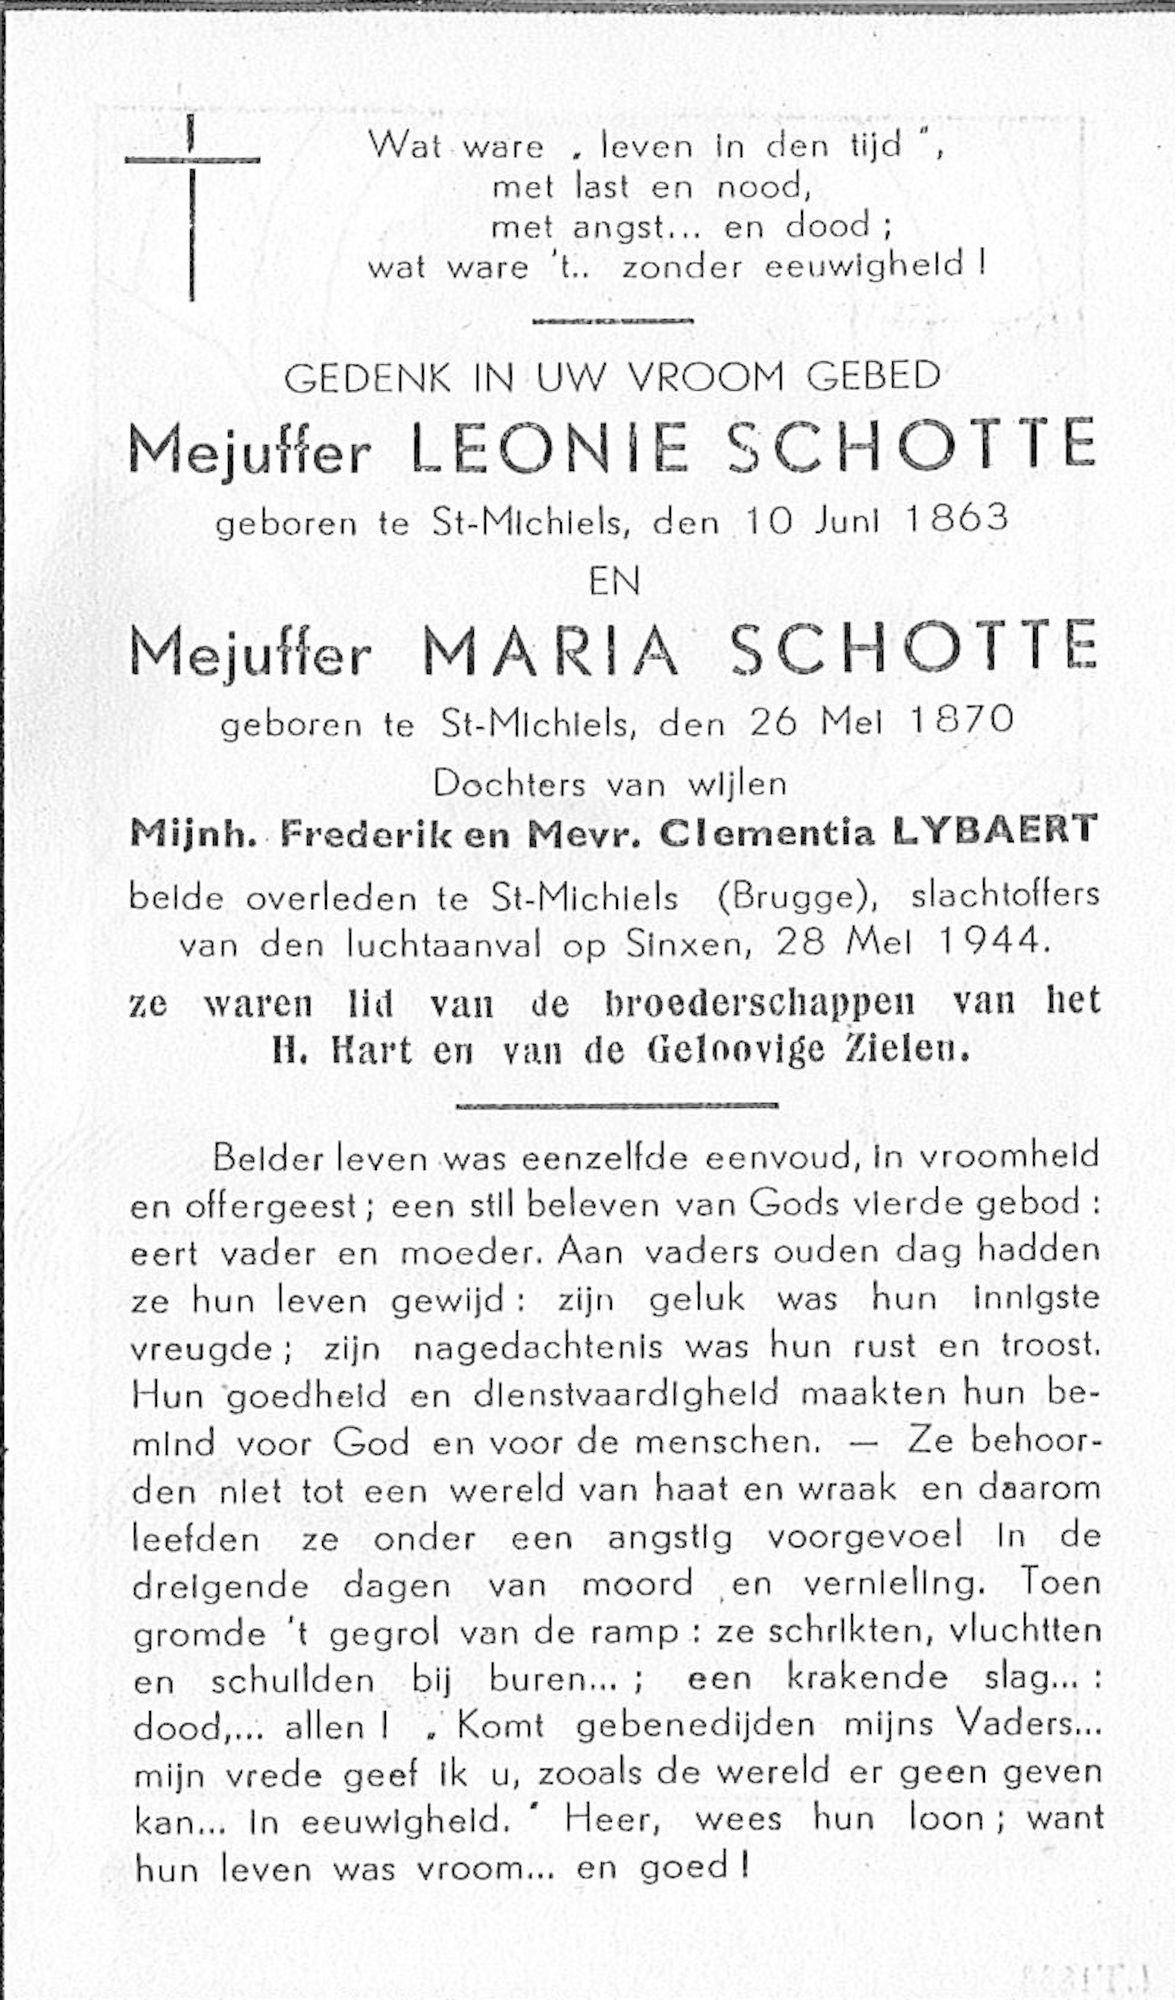 Maria Schotte